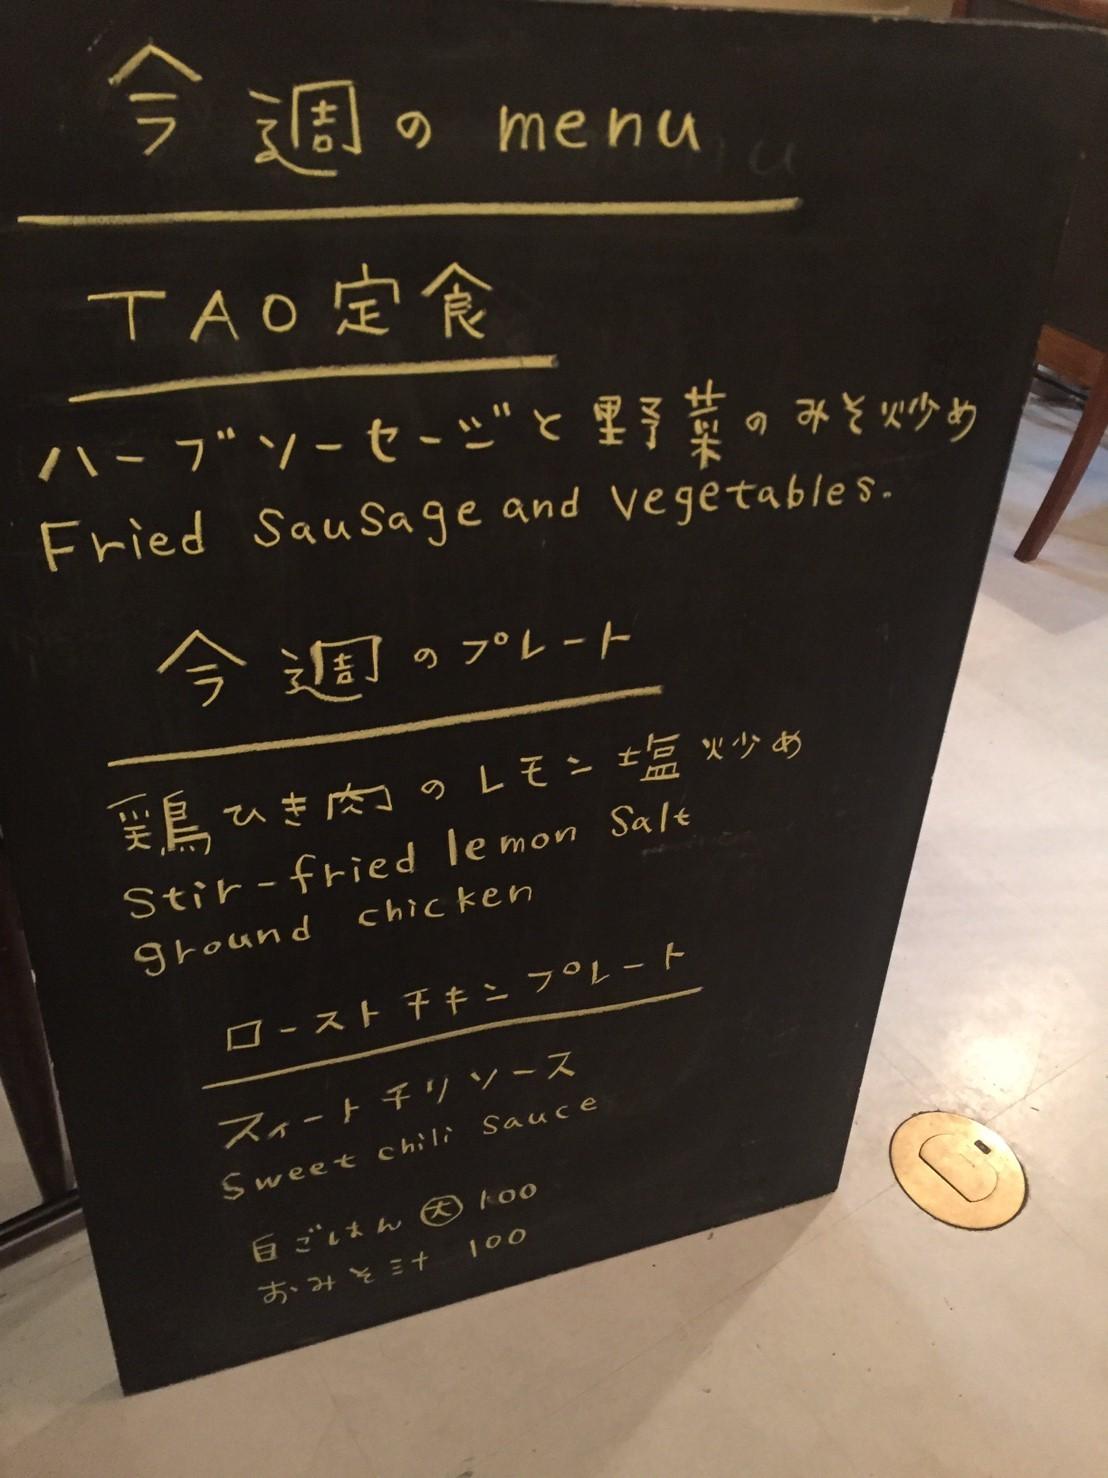 TAO CAFE にて菊池さん飲み_e0115904_07174974.jpg